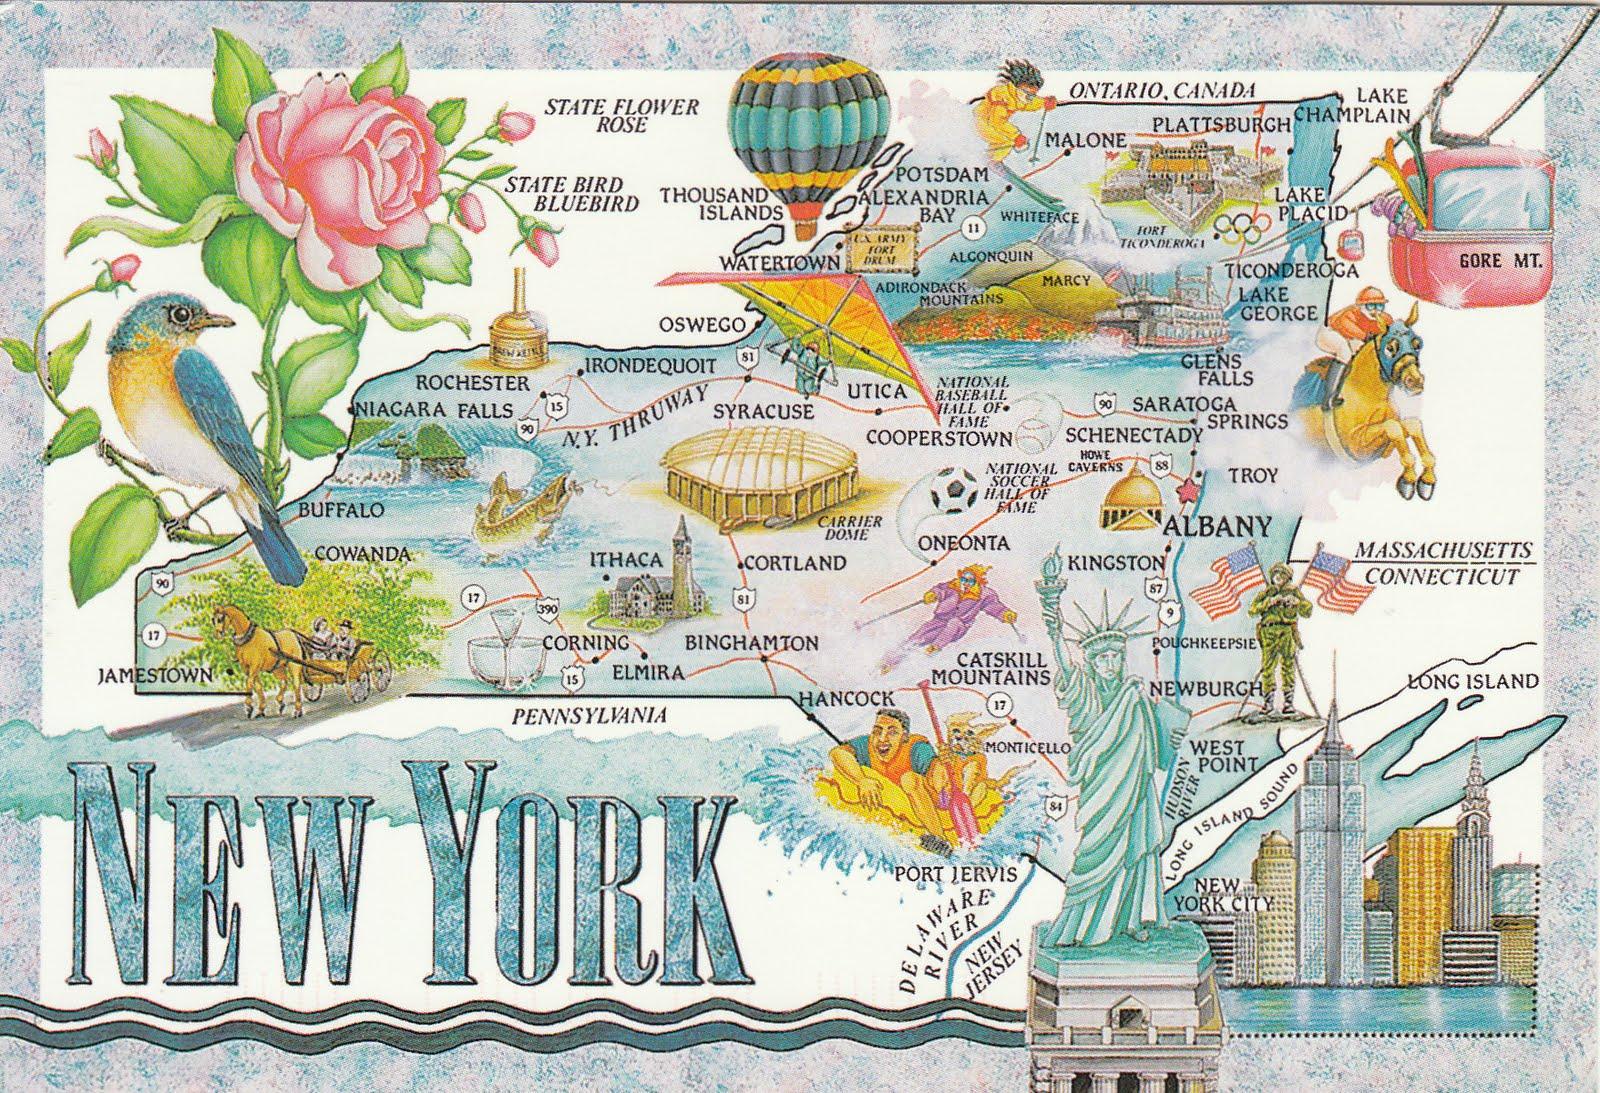 johan postcards United States New York State